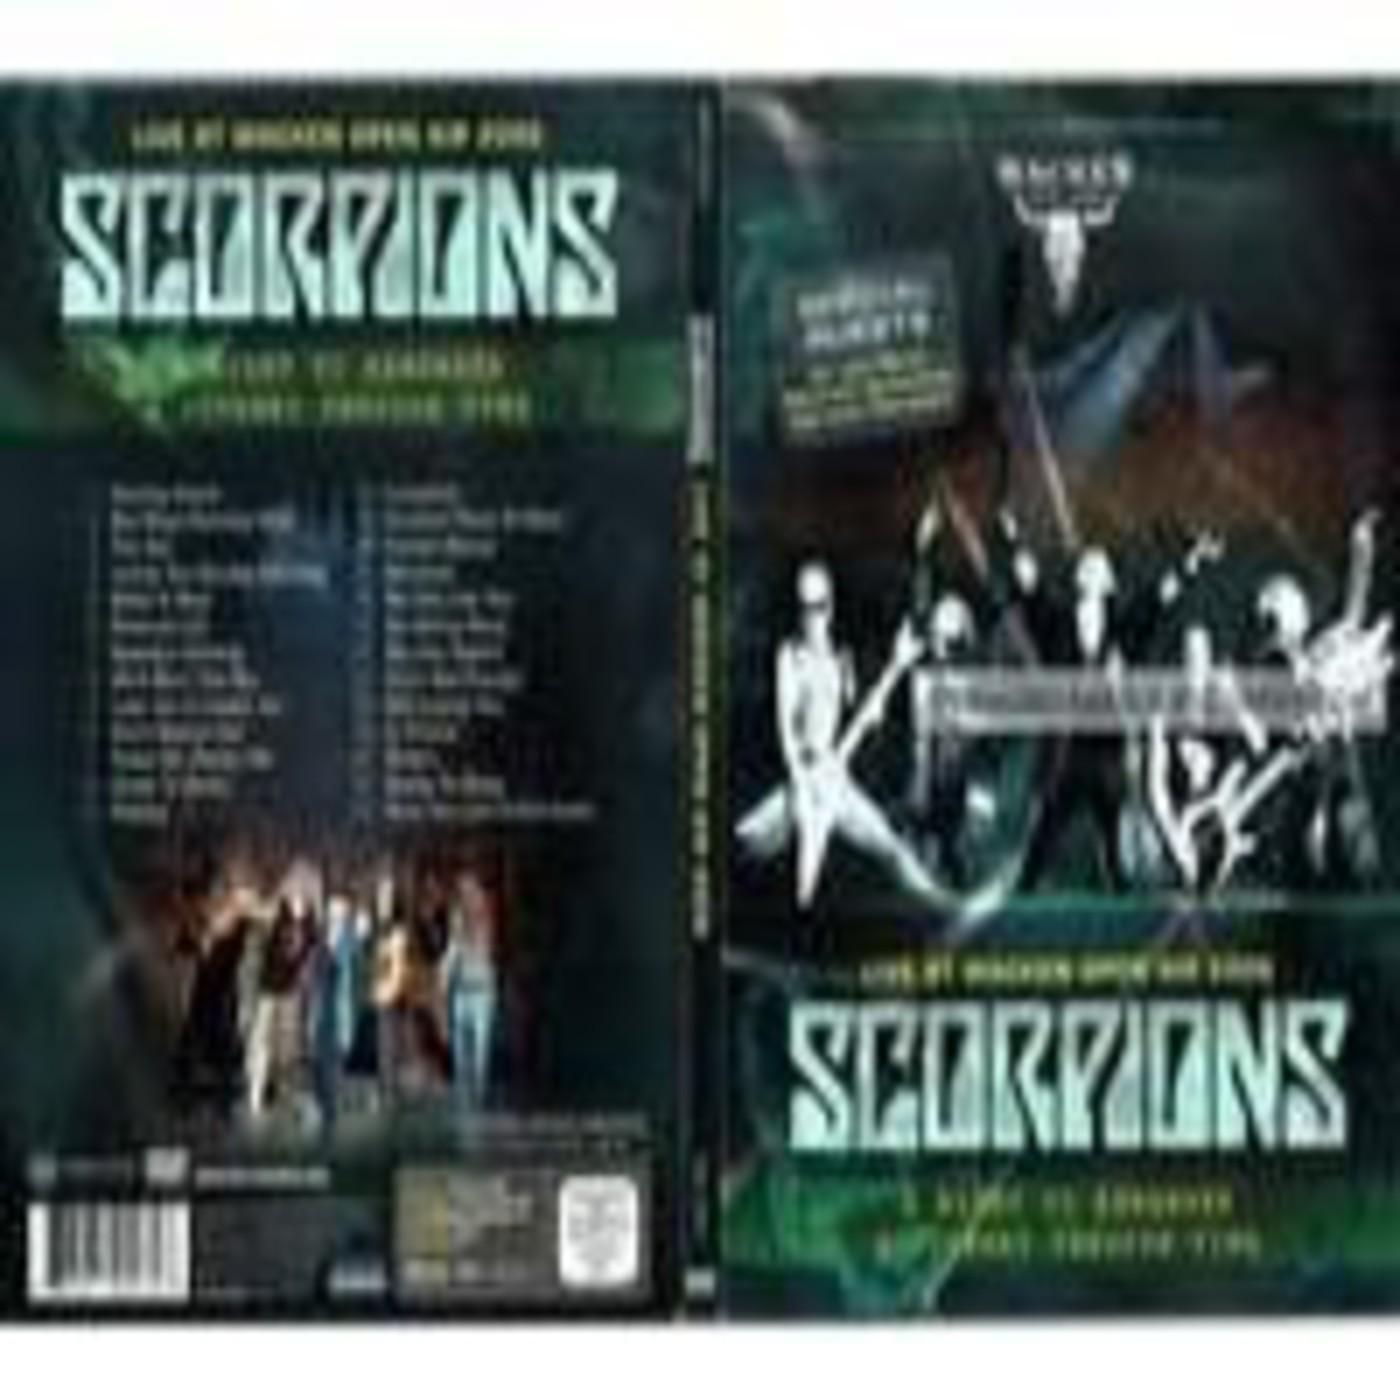 In CONCERT - Scorpion Live At Wacken Open Air 2006